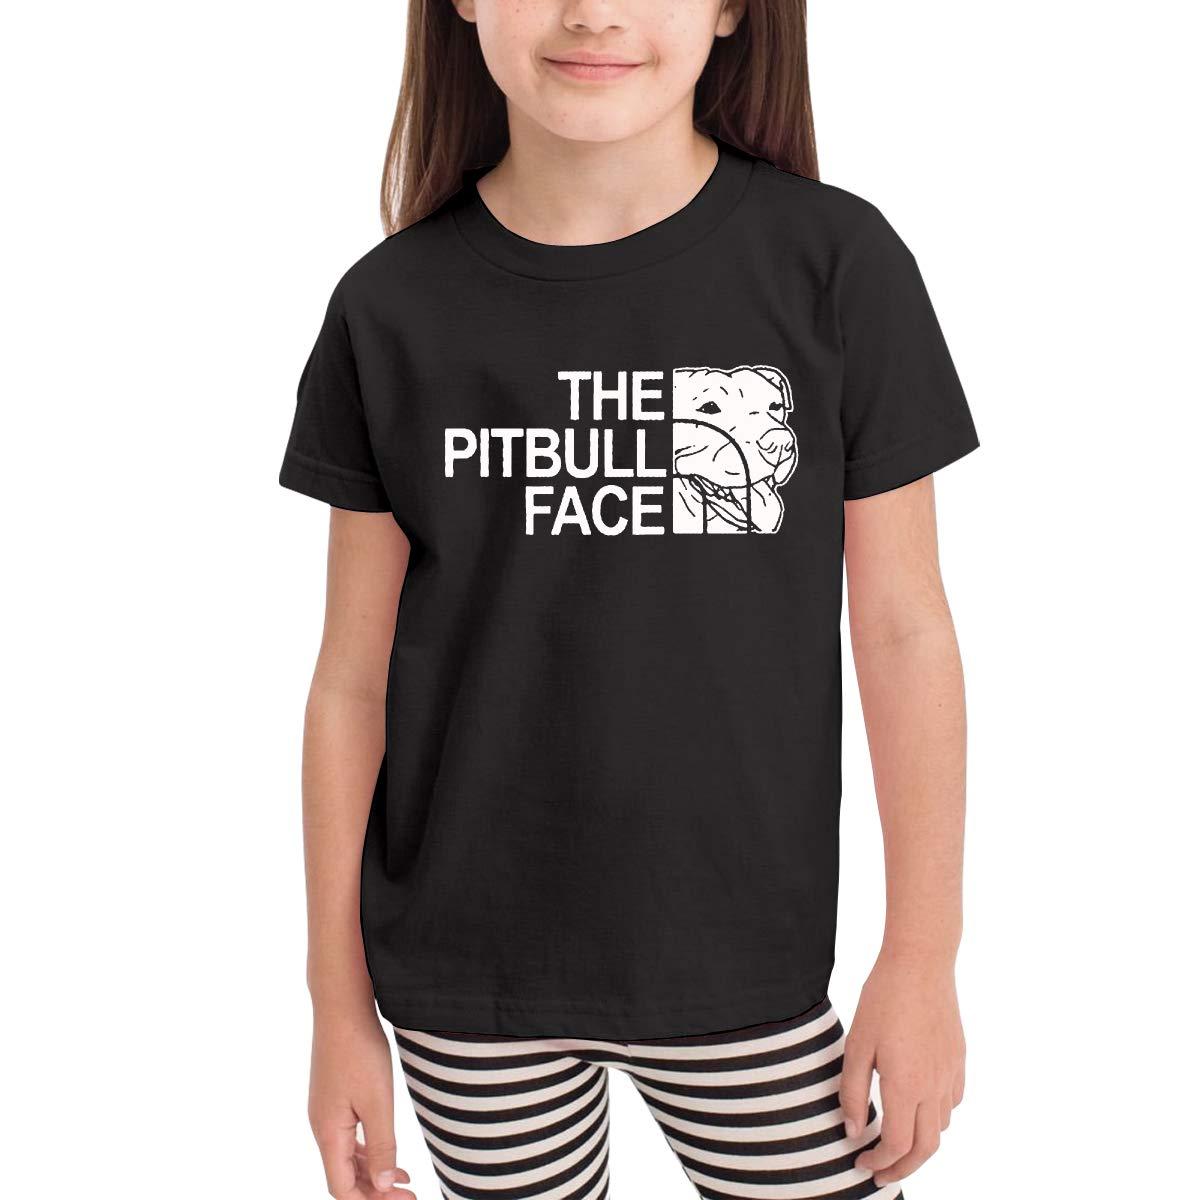 WCHUNMU Funny Pitbull Childrens Cotton Black Short Sleeve Girls T Shirt